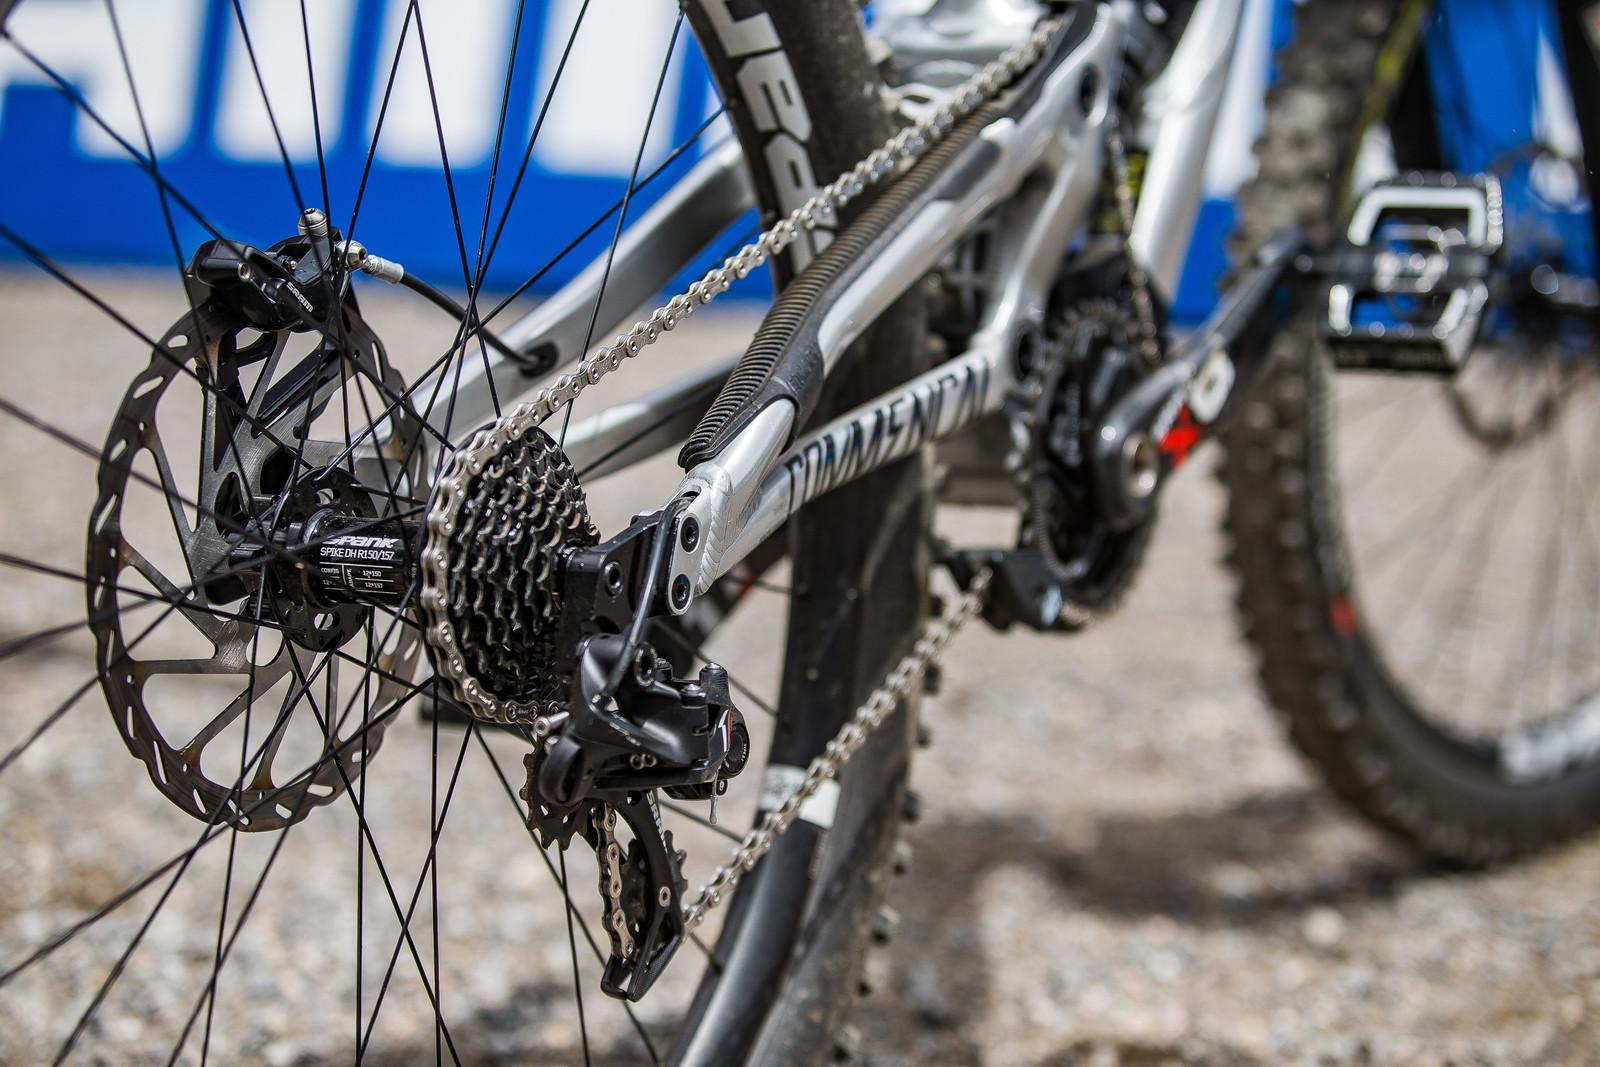 SRAM X0 DH 7-speed Drivetrain with Spank Spike DH Wheelset - WINNING BIKE: Myriam Nicole's Commencal Supreme DH V4 - Mountain Biking Pictures - Vital MTB